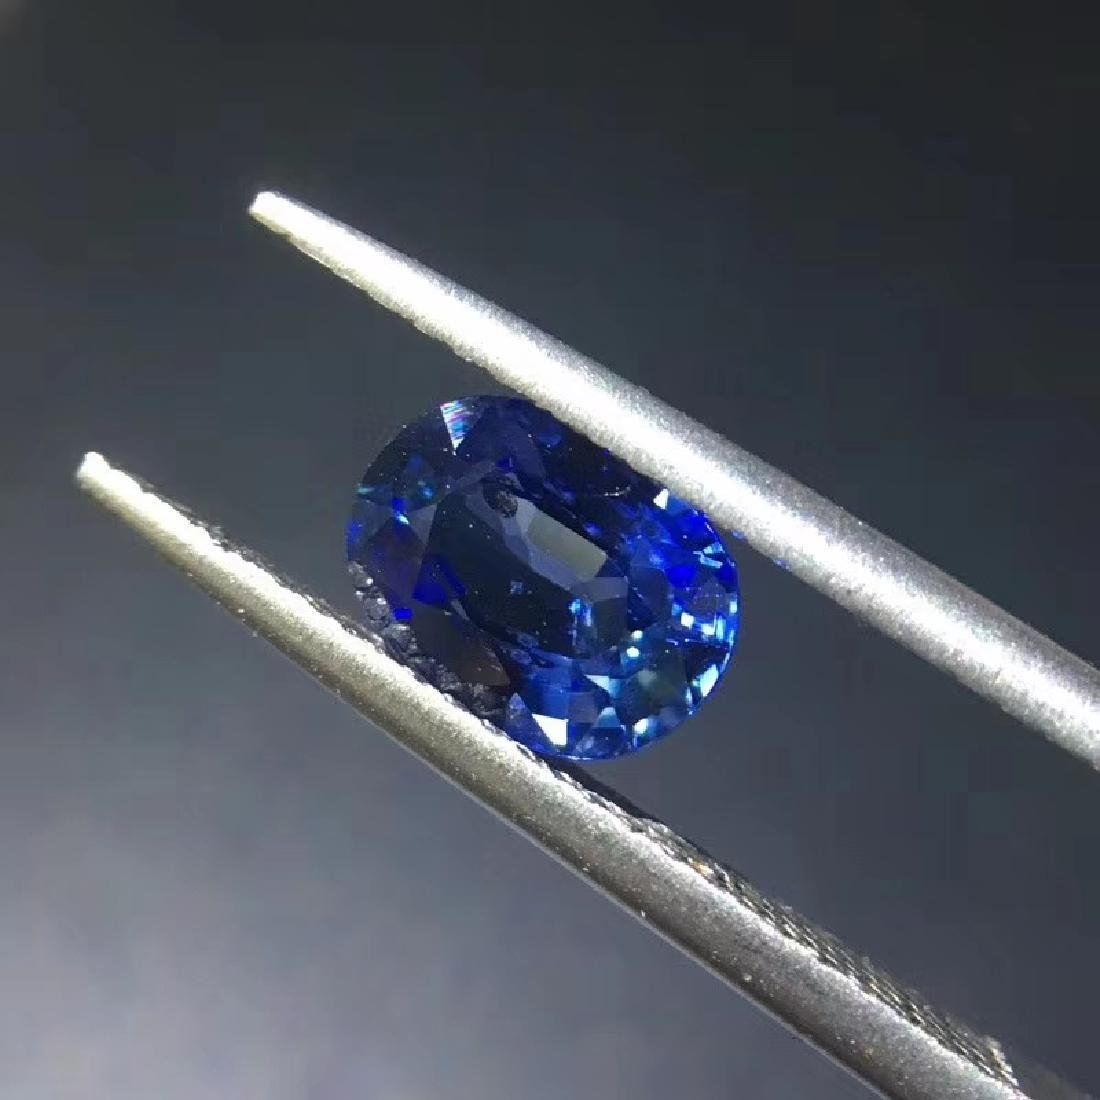 1.38 ct Sapphire 5.5*7.4*3.5 mm Oval Cut - 2